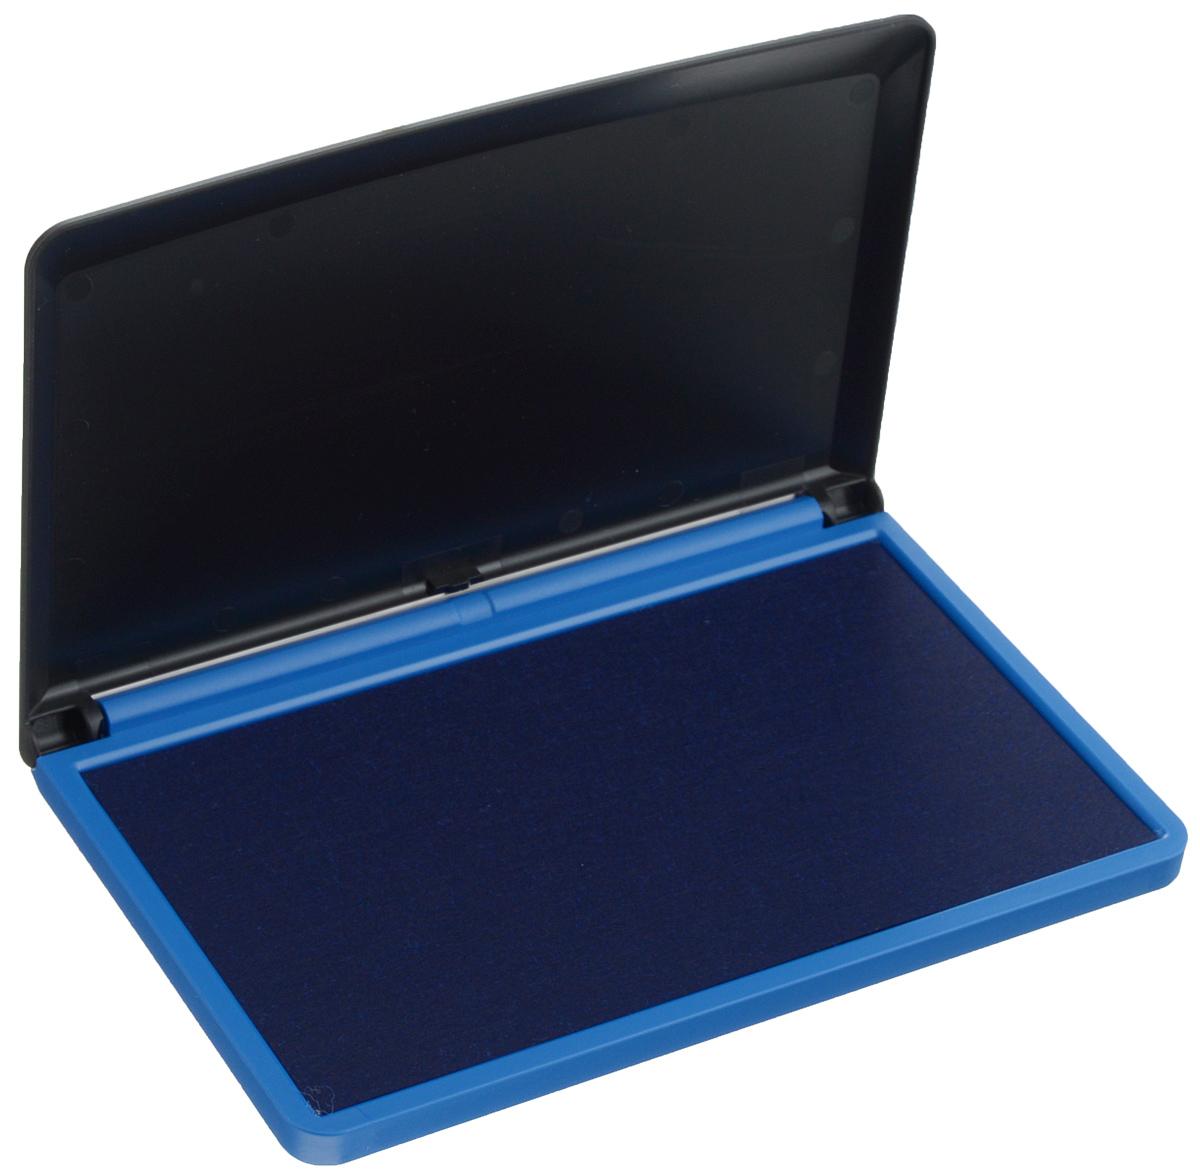 ColopНастольная штемпельная подушка цвет синий 90 х 160 мм Colop